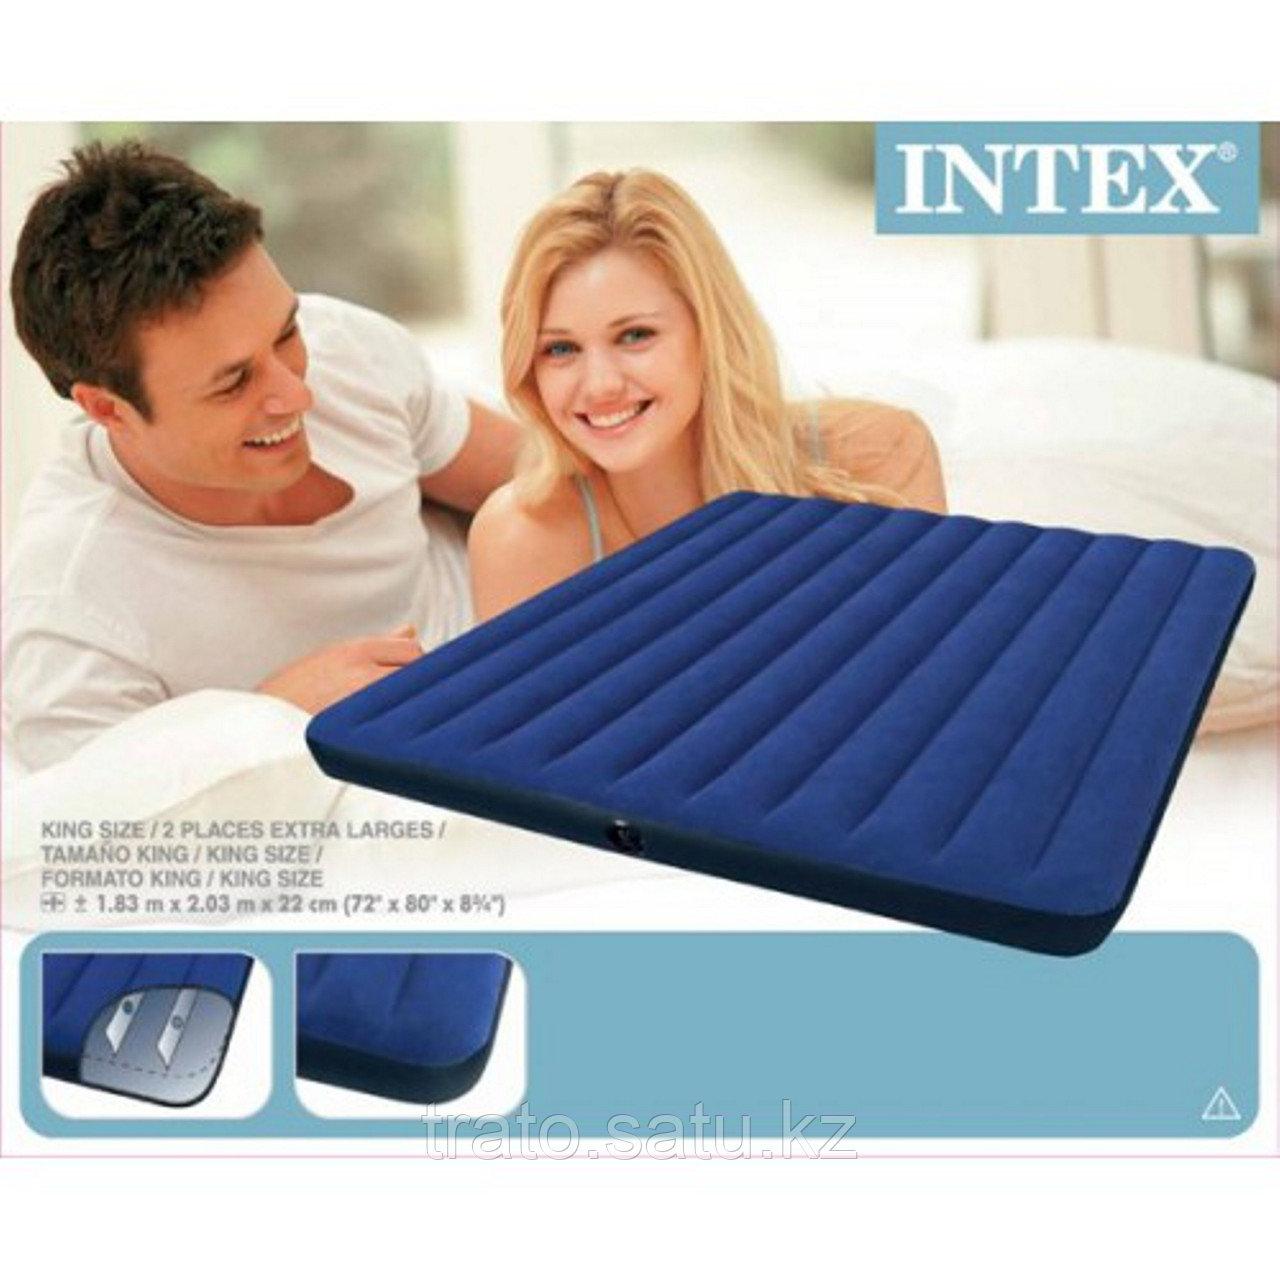 Intex 203x183x25